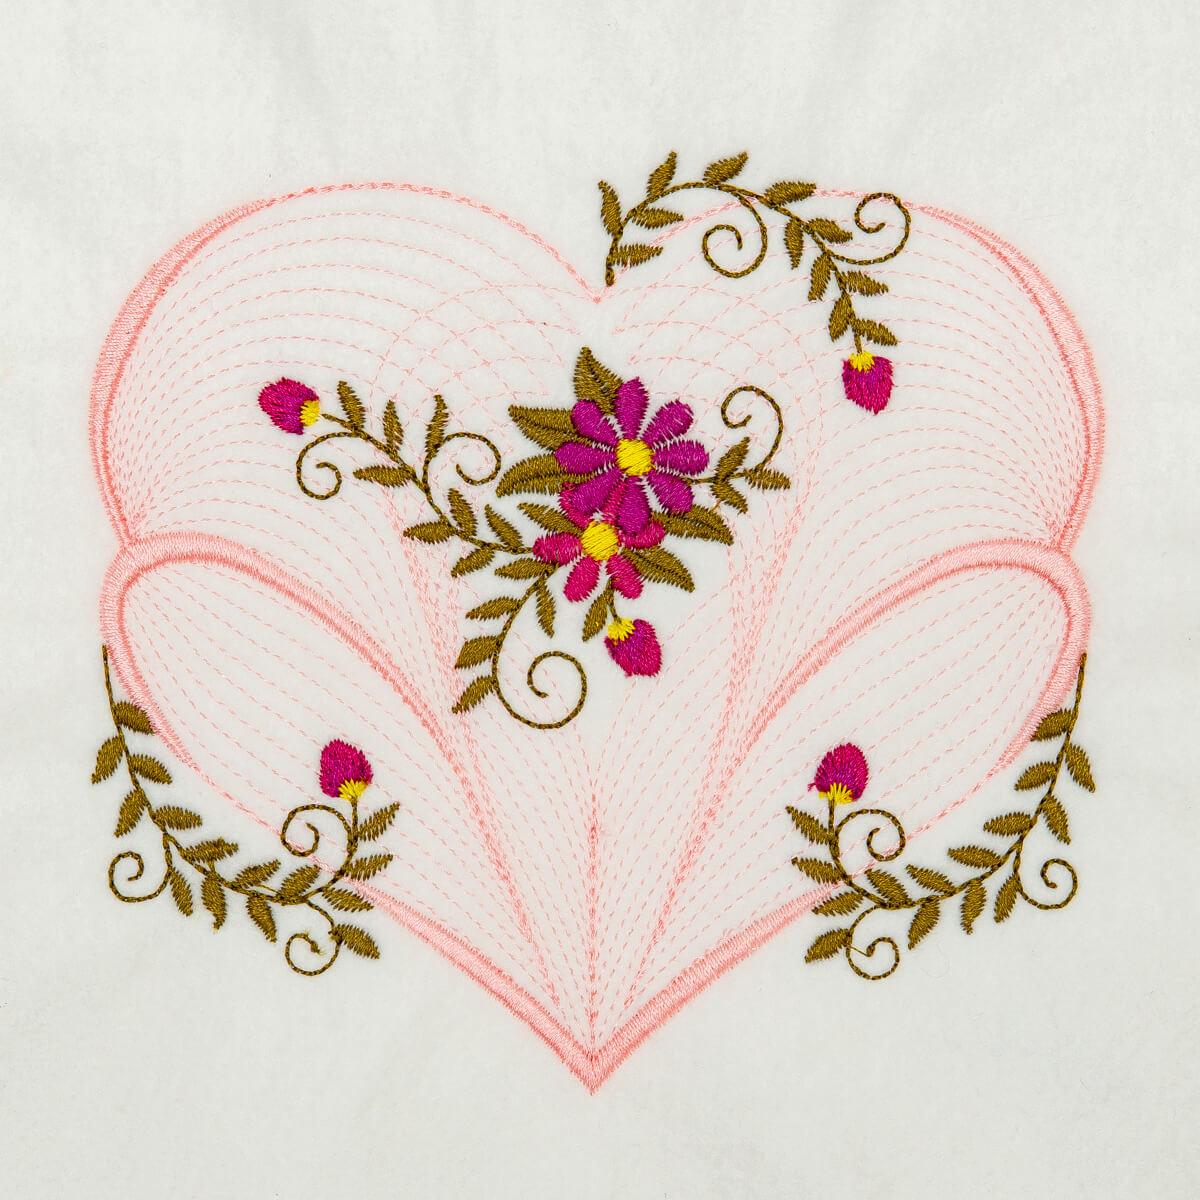 Matriz de bordado floral rippled 16